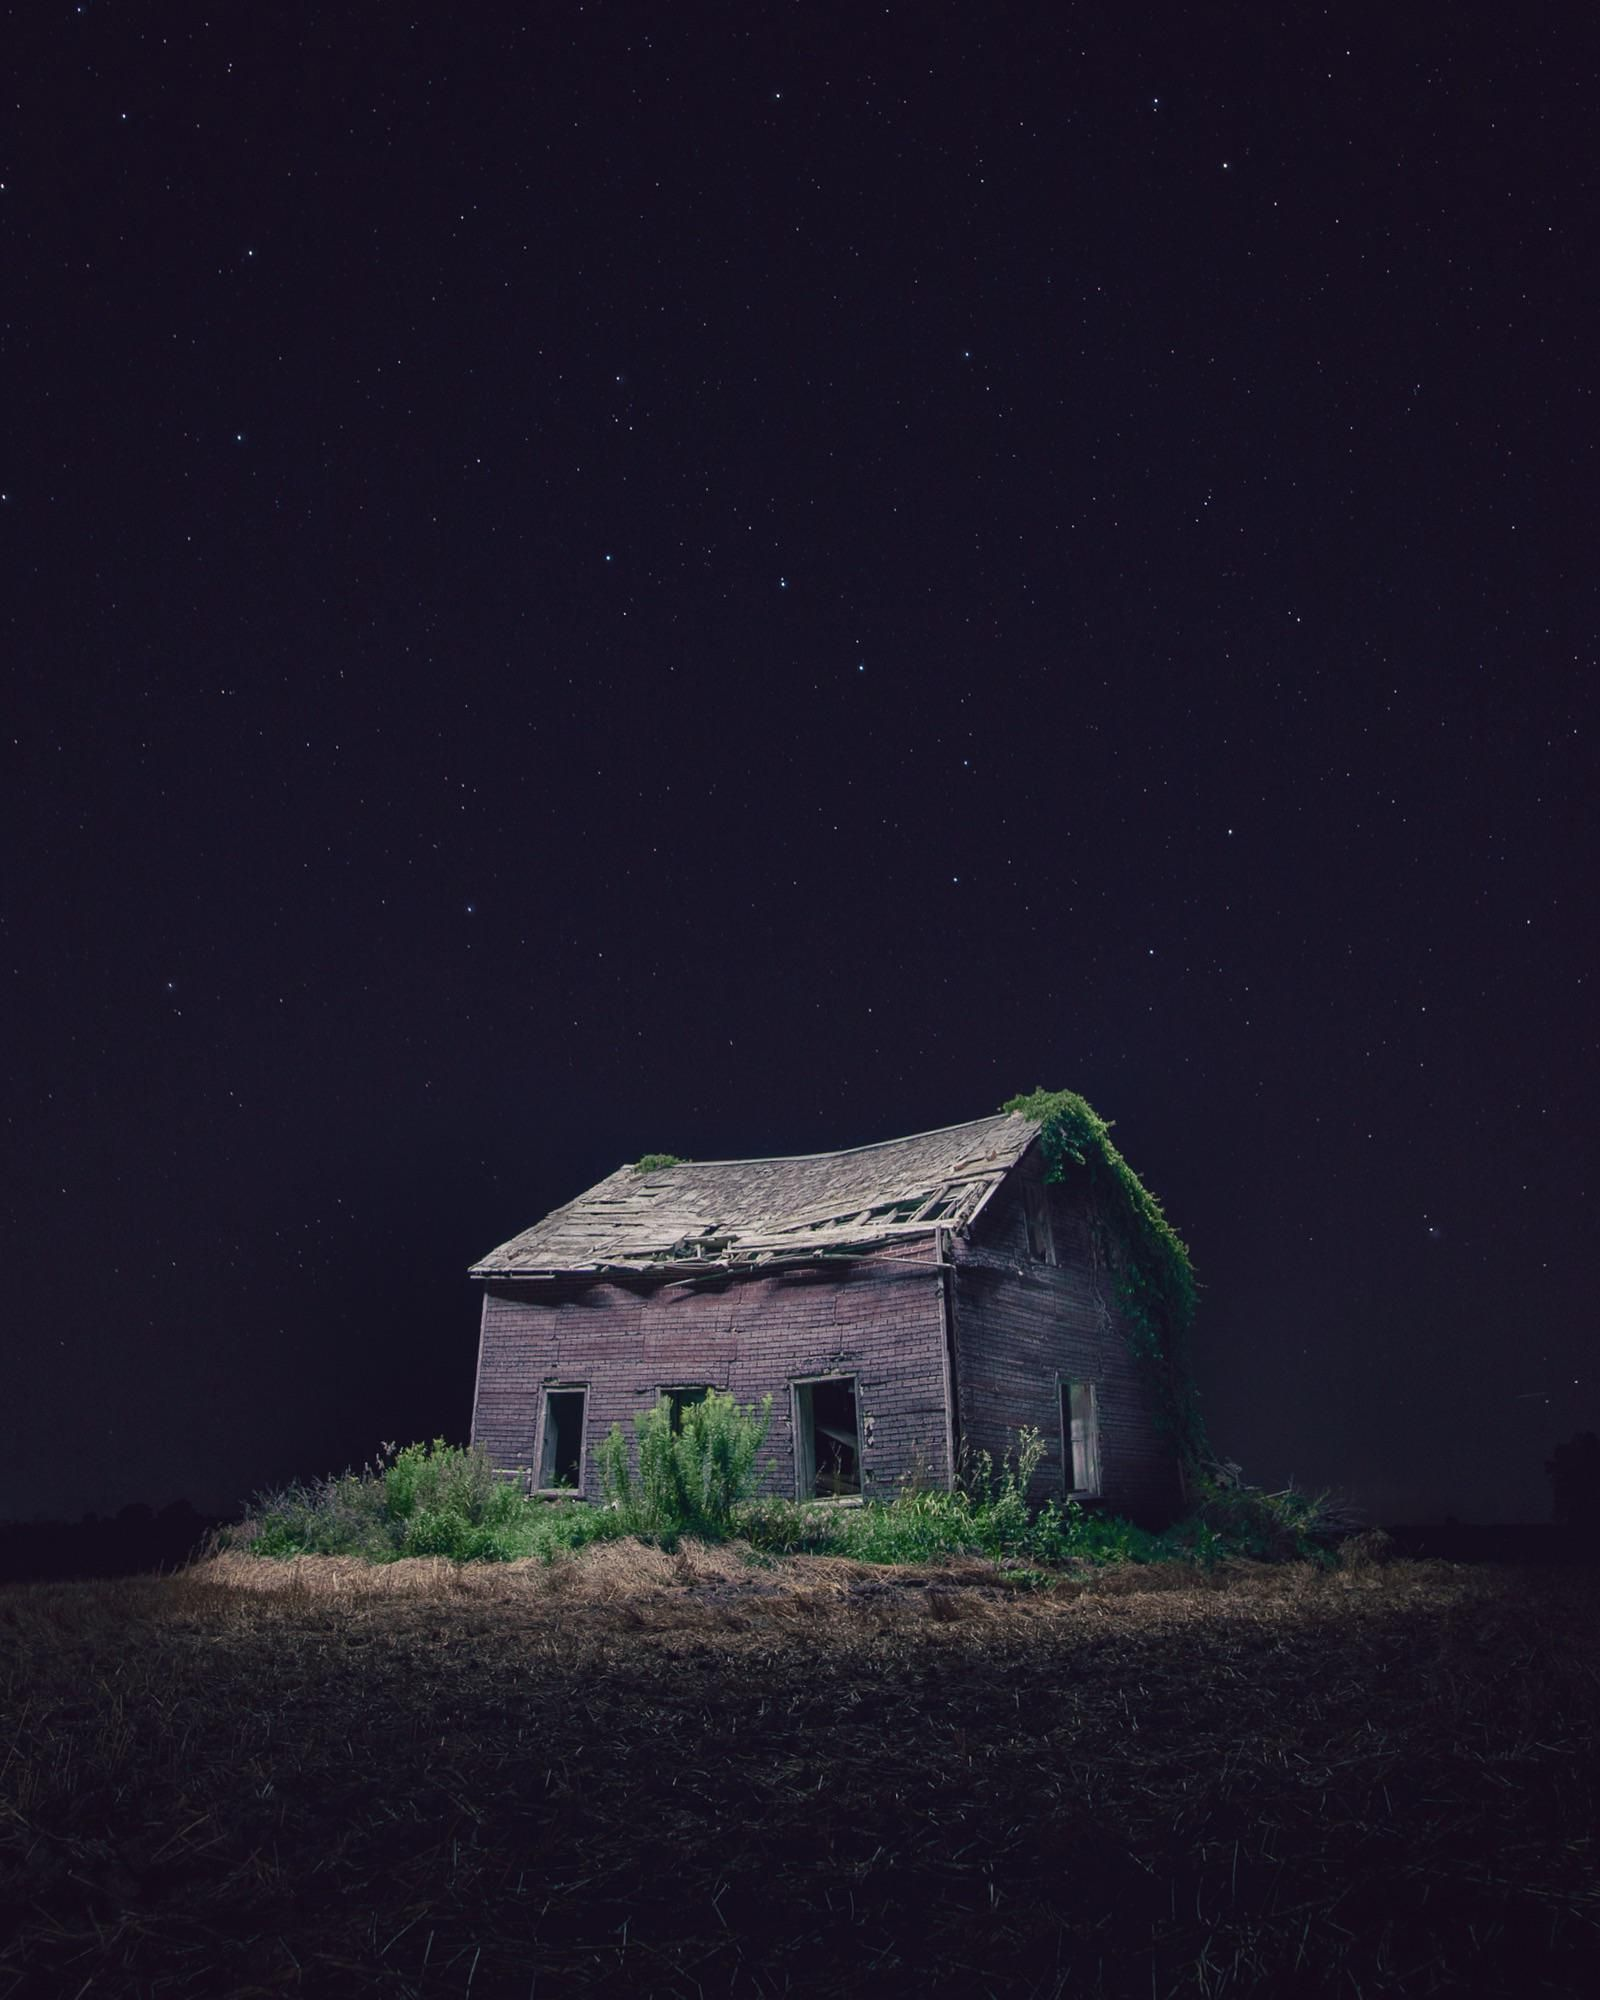 Abandoned Farmhouse Under The Stars